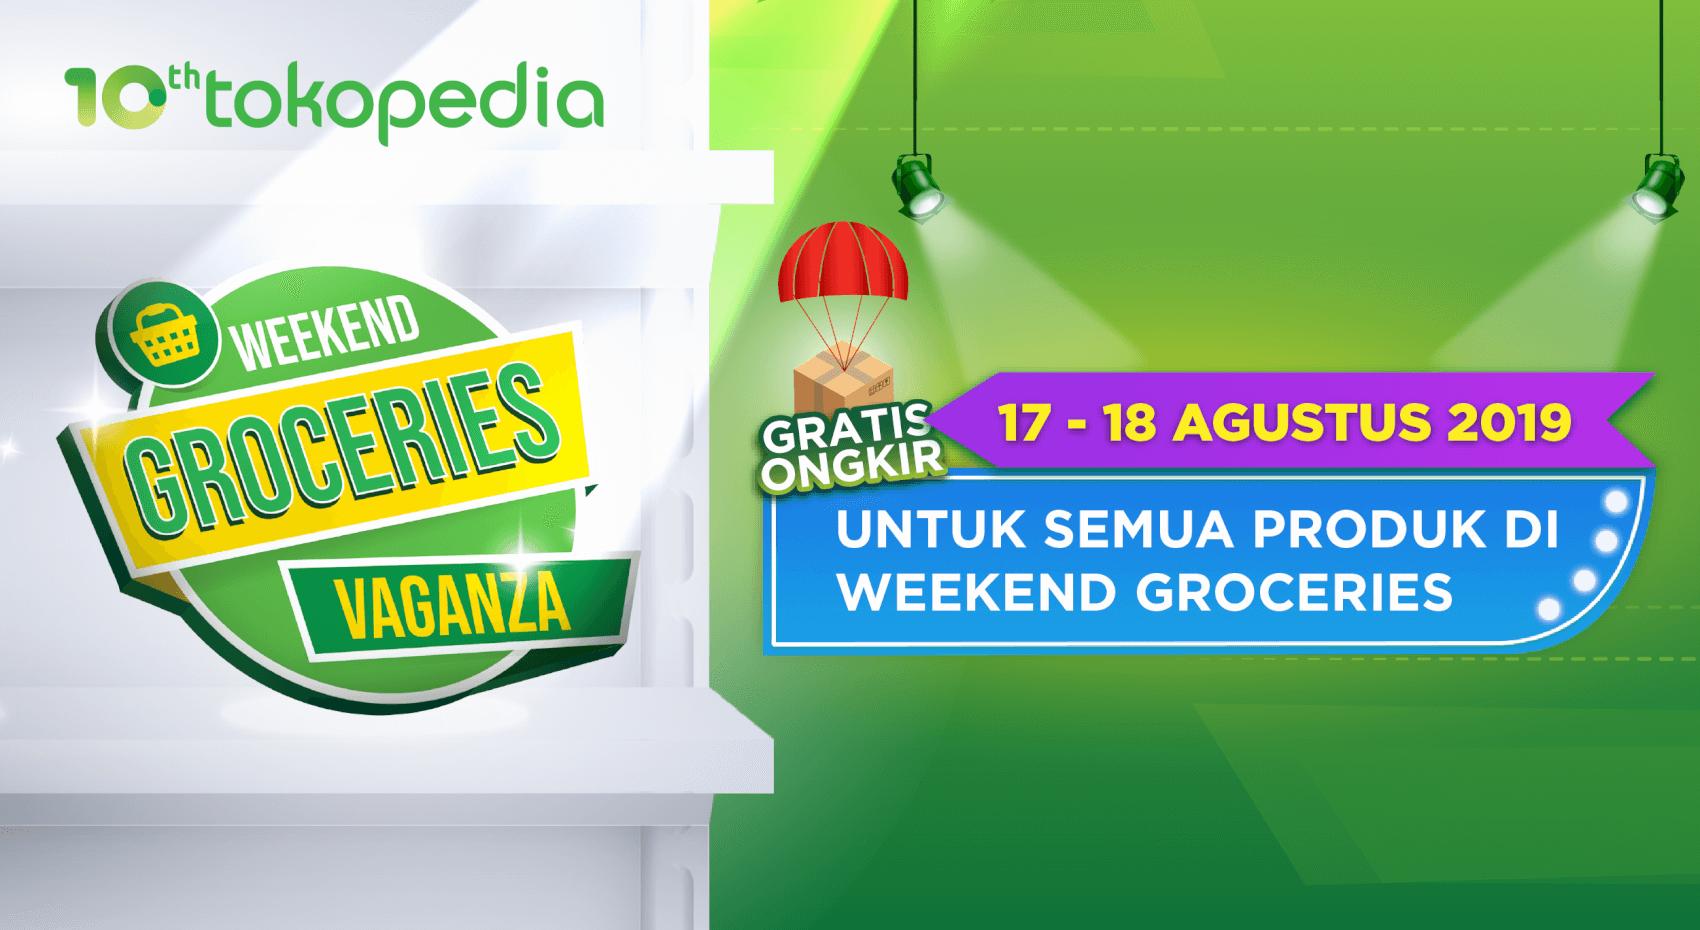 Gratis Ongkir Weekend Groceries Vaganza di Official Store